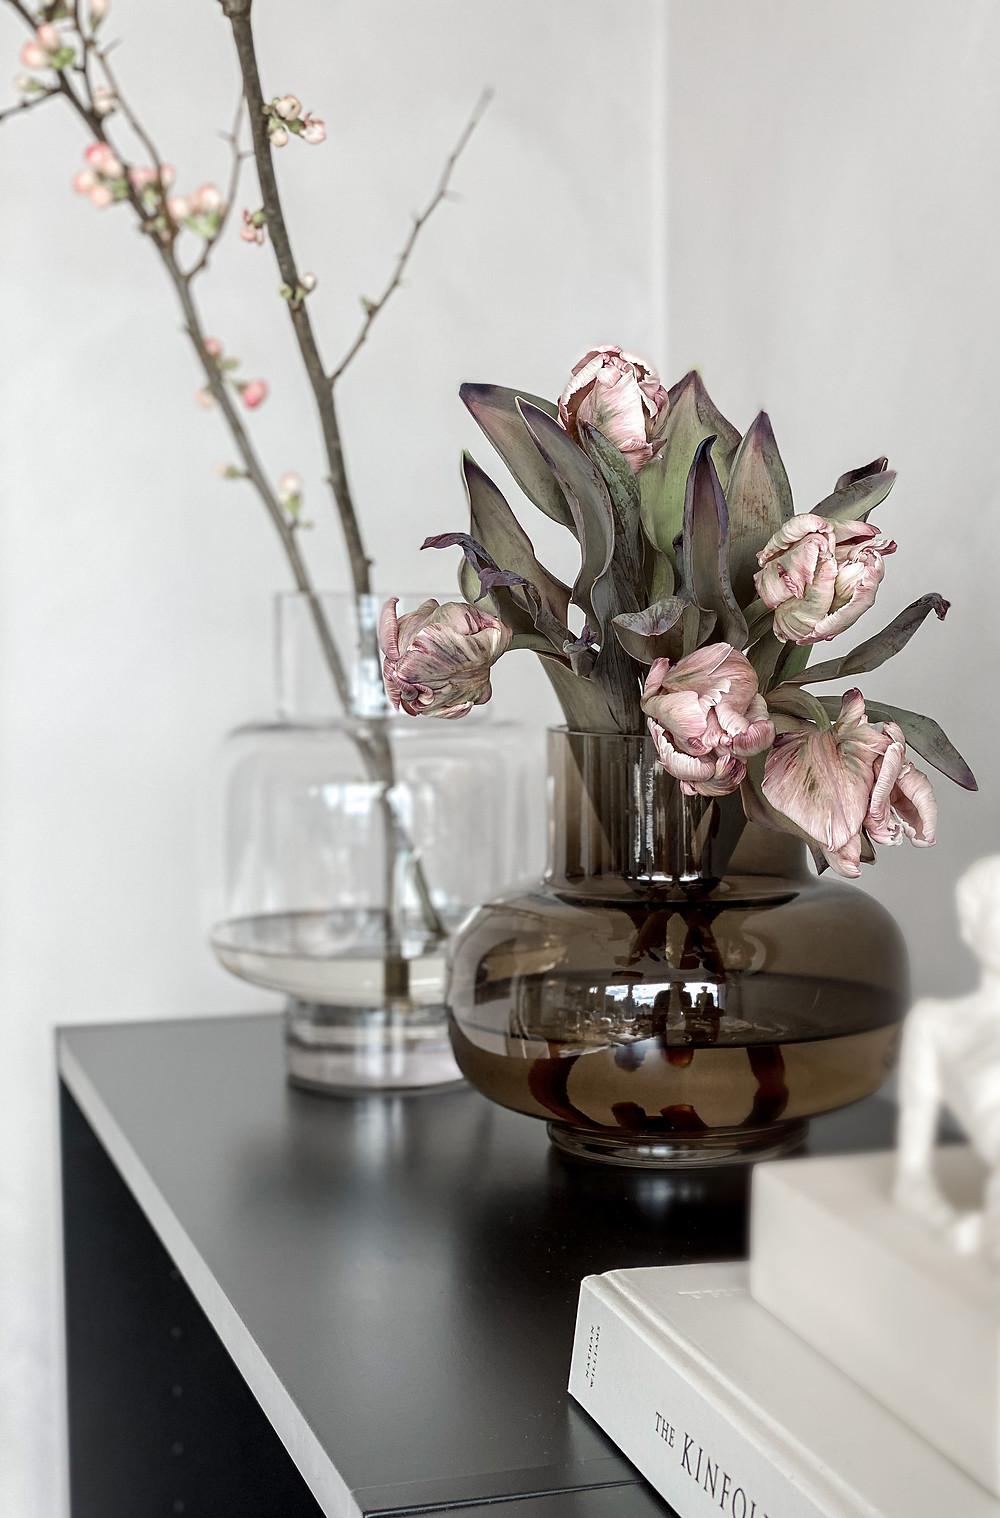 storefactory_Vase storefactory_Skandi Style_Nordic Living_happyful Blog_Dekoration online shoppen_happyful shop